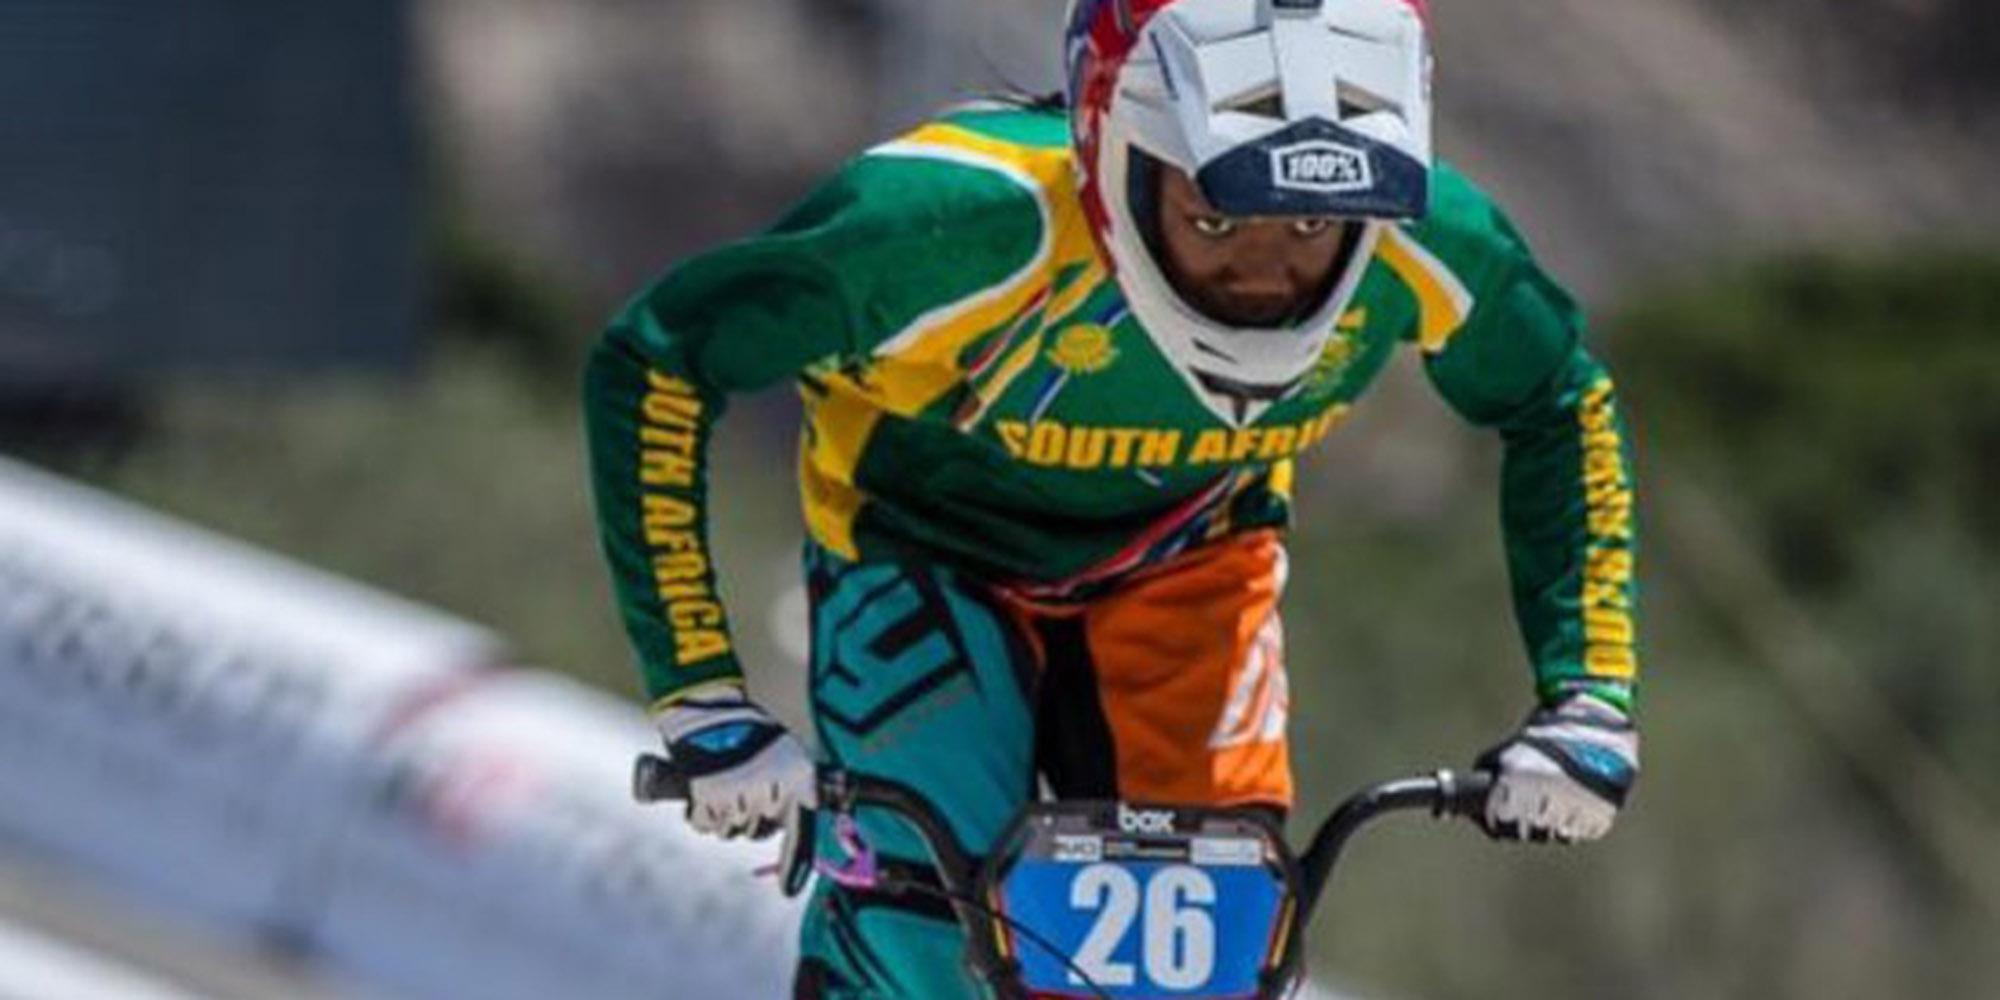 Born to ride: Meet the future of BMX, Miyanda Maseti